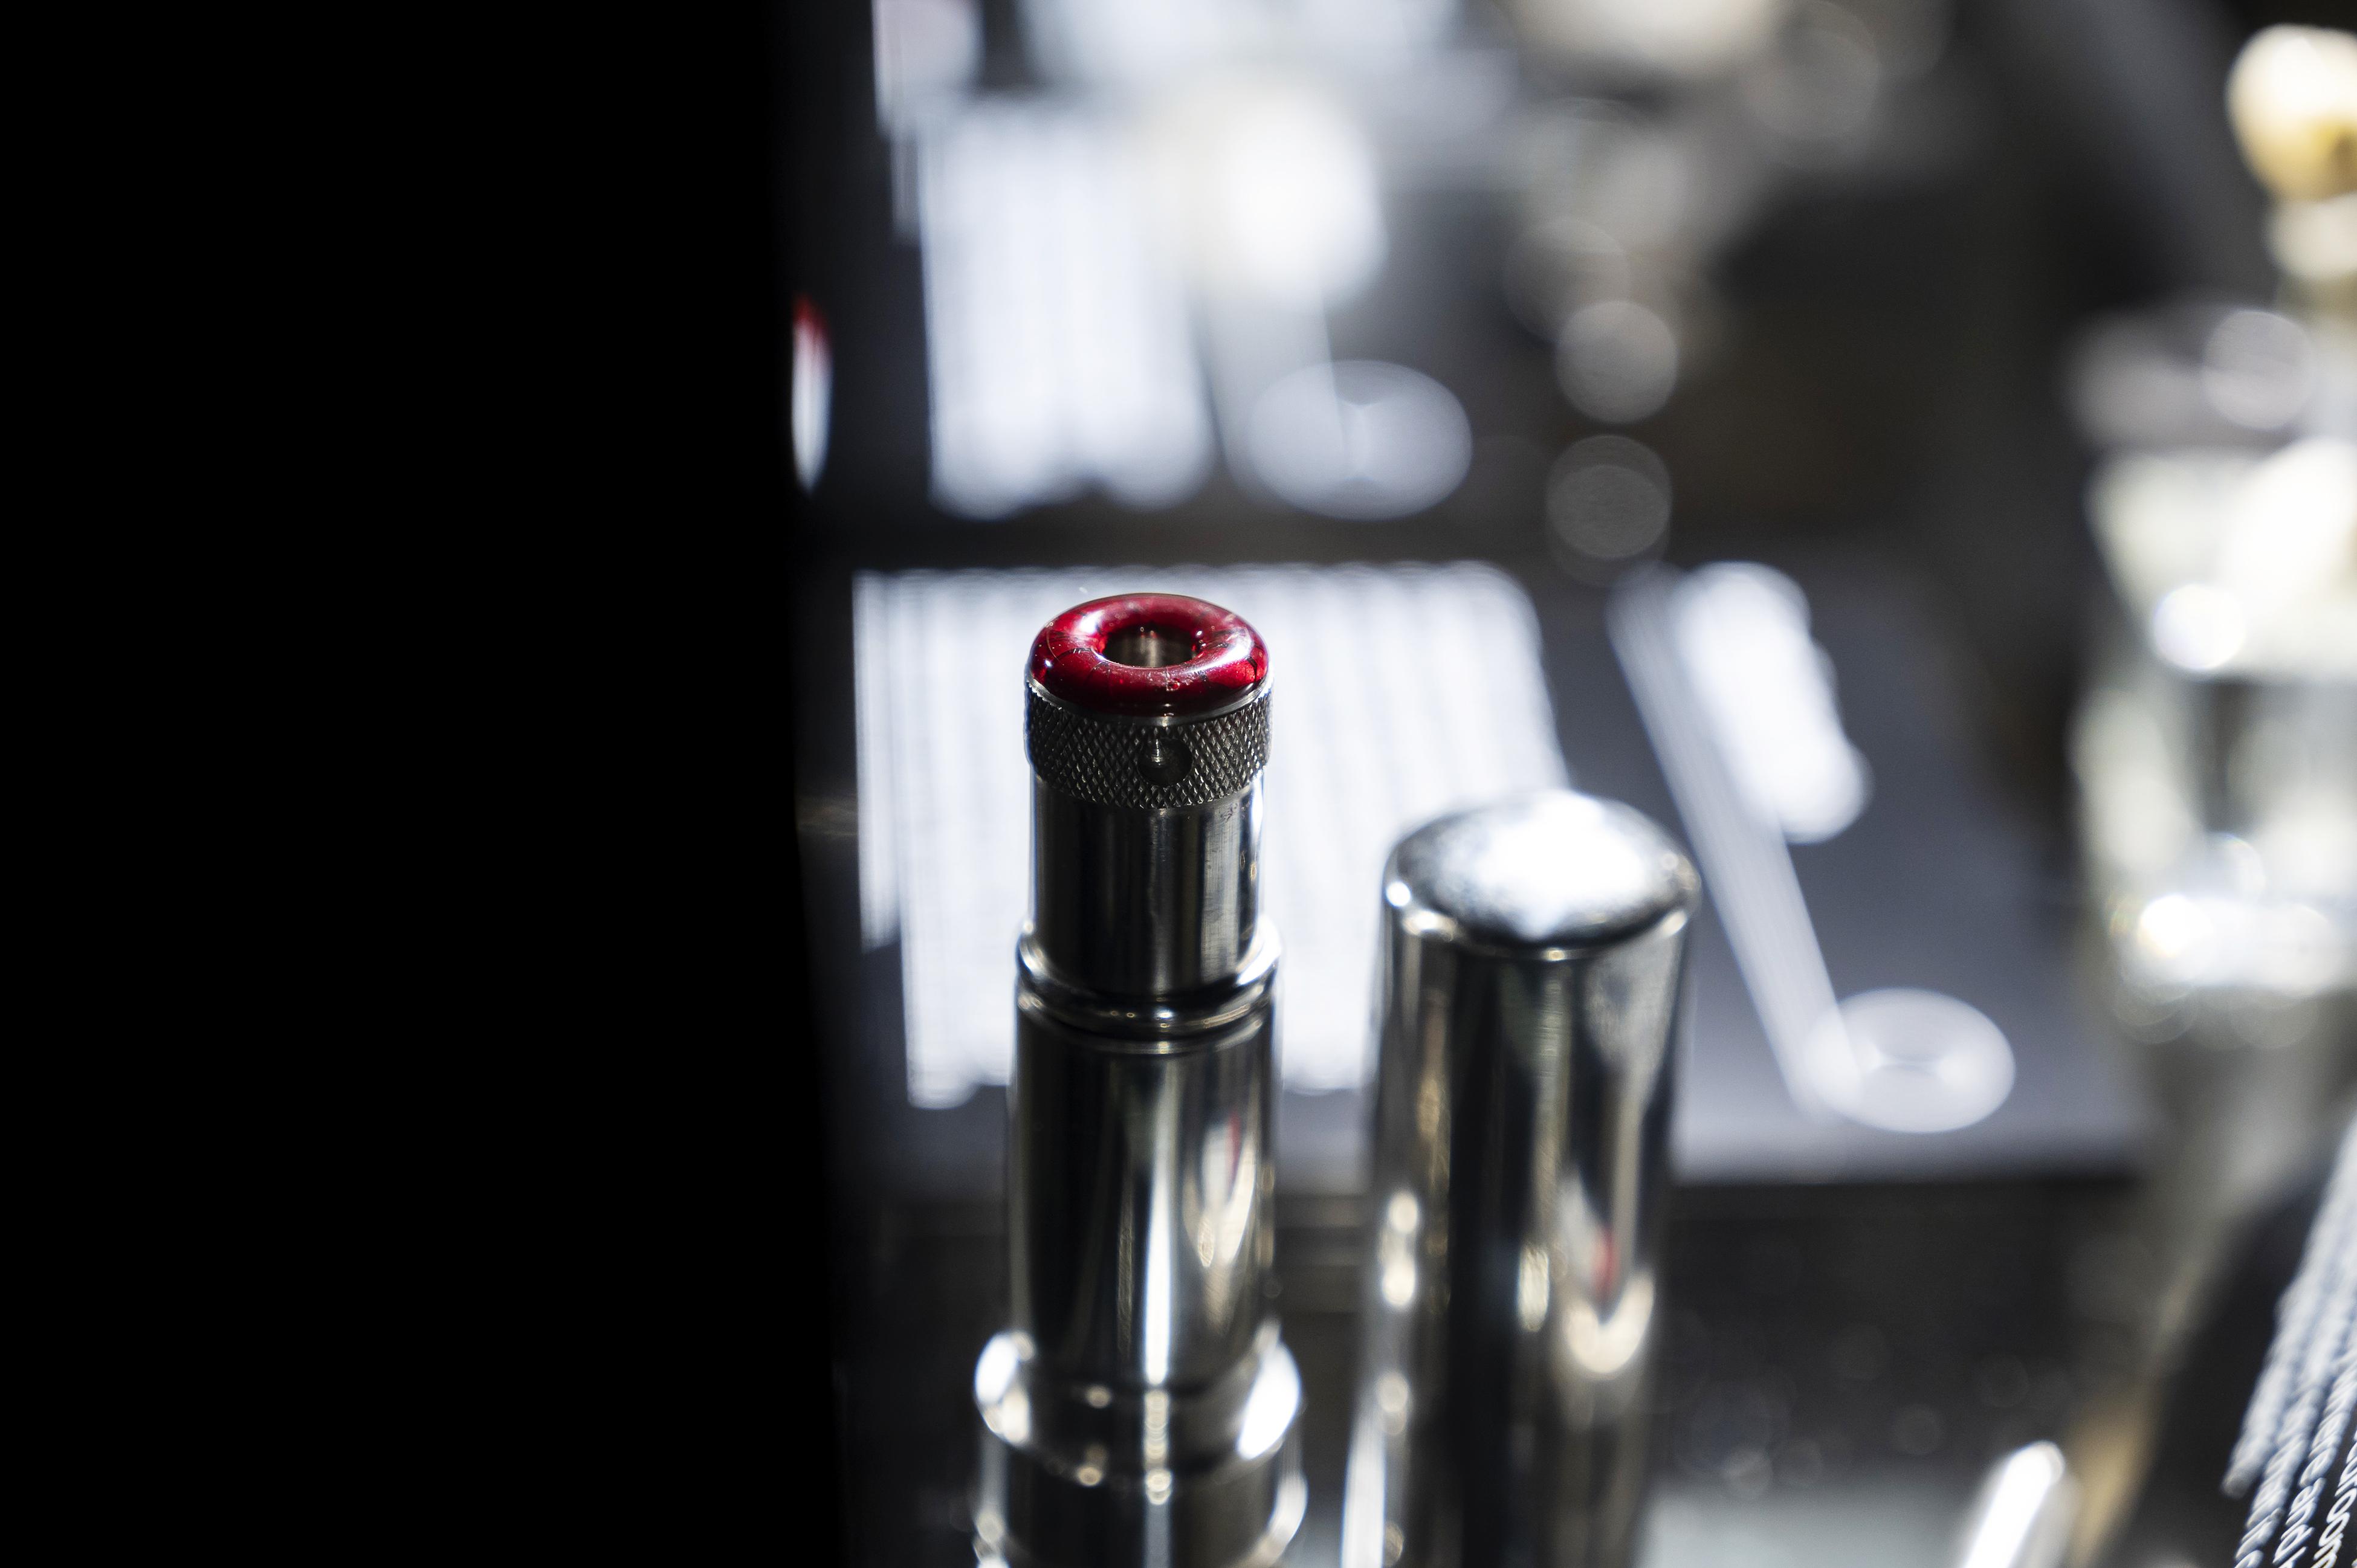 A lipstick gun at the spy museum.